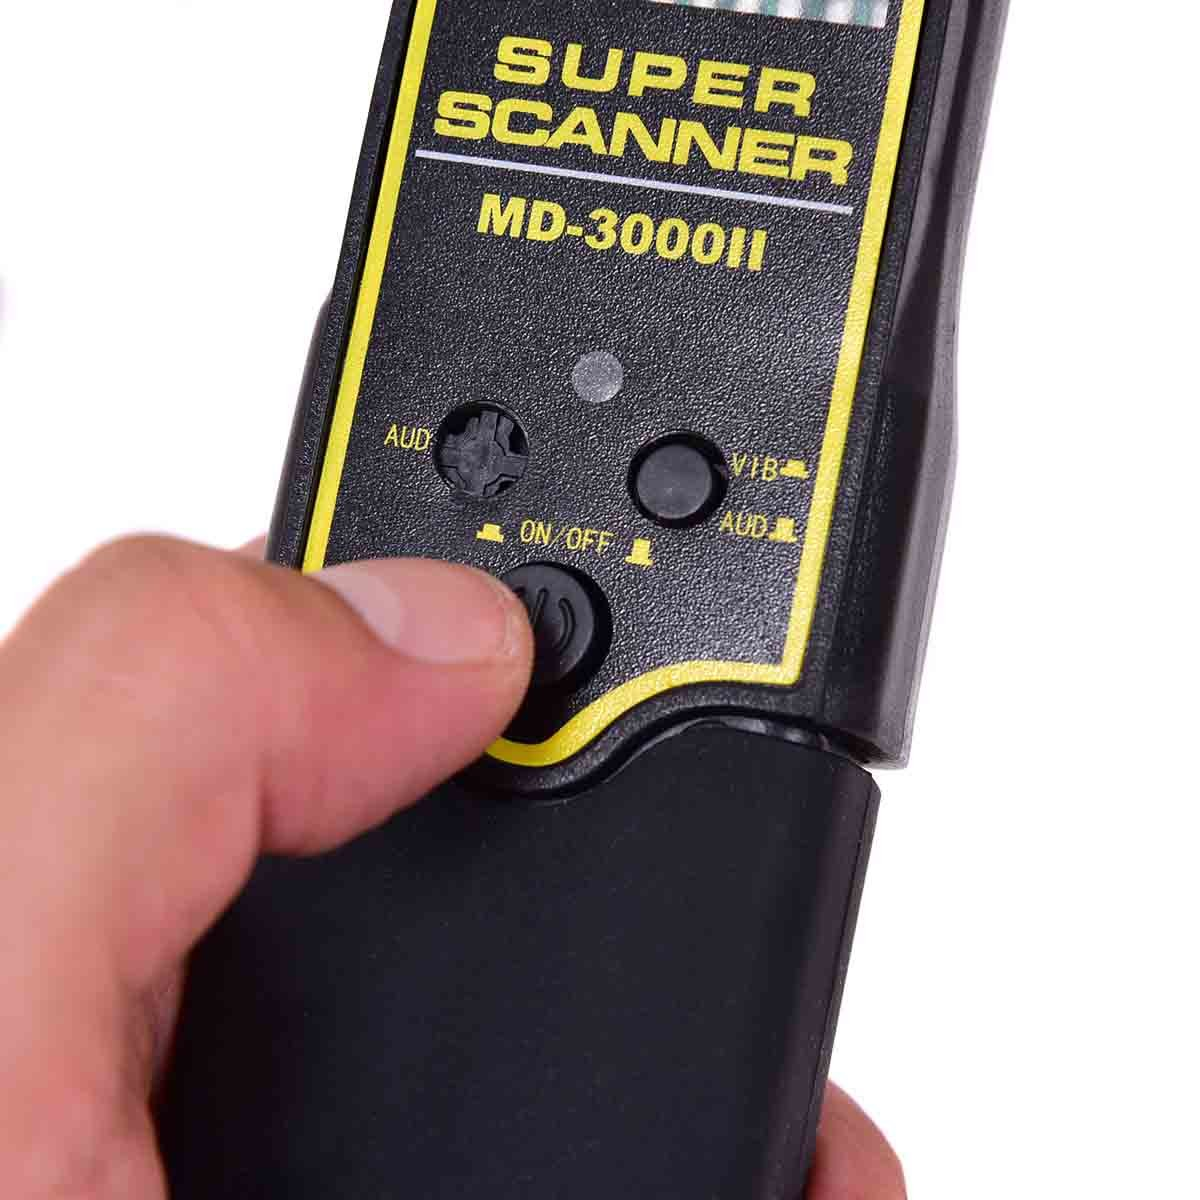 Amazon.com : Toolsempire Hand Held Scanner Metal Detector High Sensitivity Metal Scanner Alarm and Vibration Super Scanner Metal Finder : Garden & Outdoor